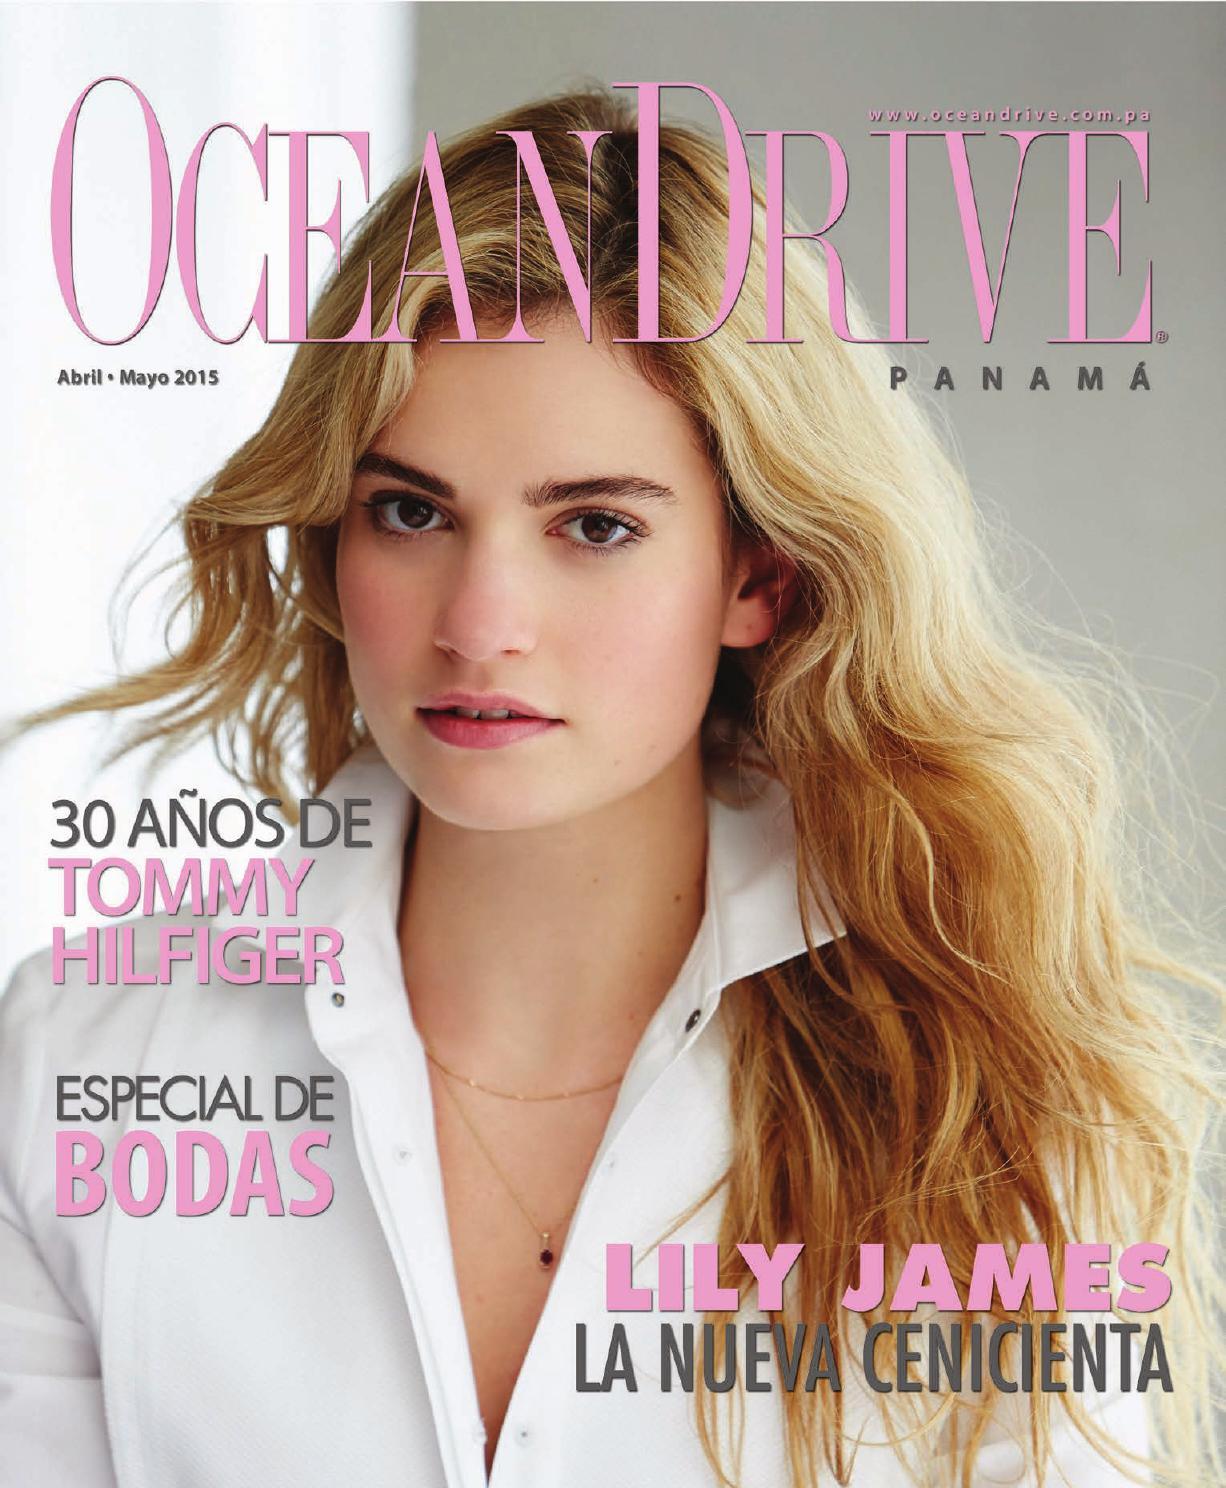 Ocean Drive Panama abril-mayo 2015 by Ocean Drive Magazine Panama - issuu 08275198eb5